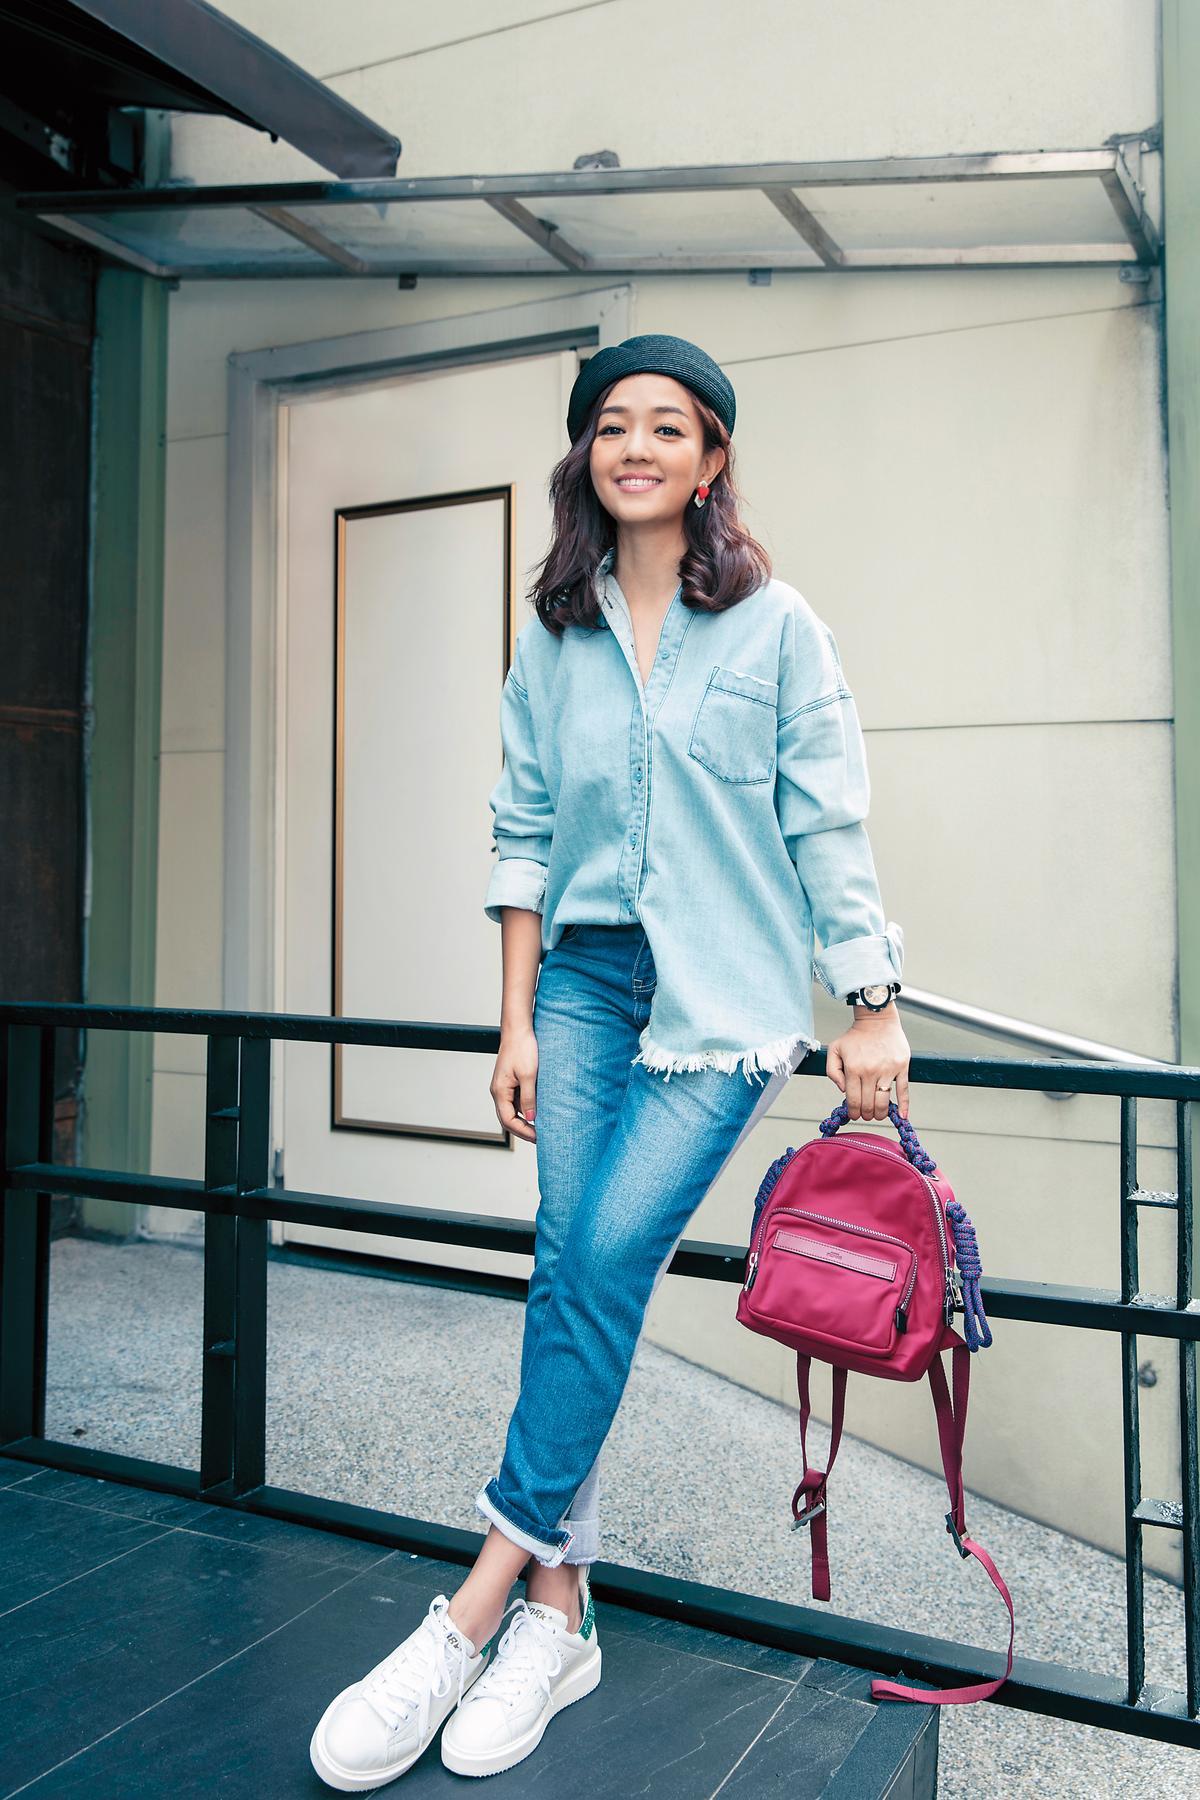 MOUSSY丹寧襯衫。約NT$3,500/日本買的RODEO CROWNS 丹寧褲。約NT$3,000/PROMAX後背包。NT$4,350/Golden Goose球鞋。約NT$18,000